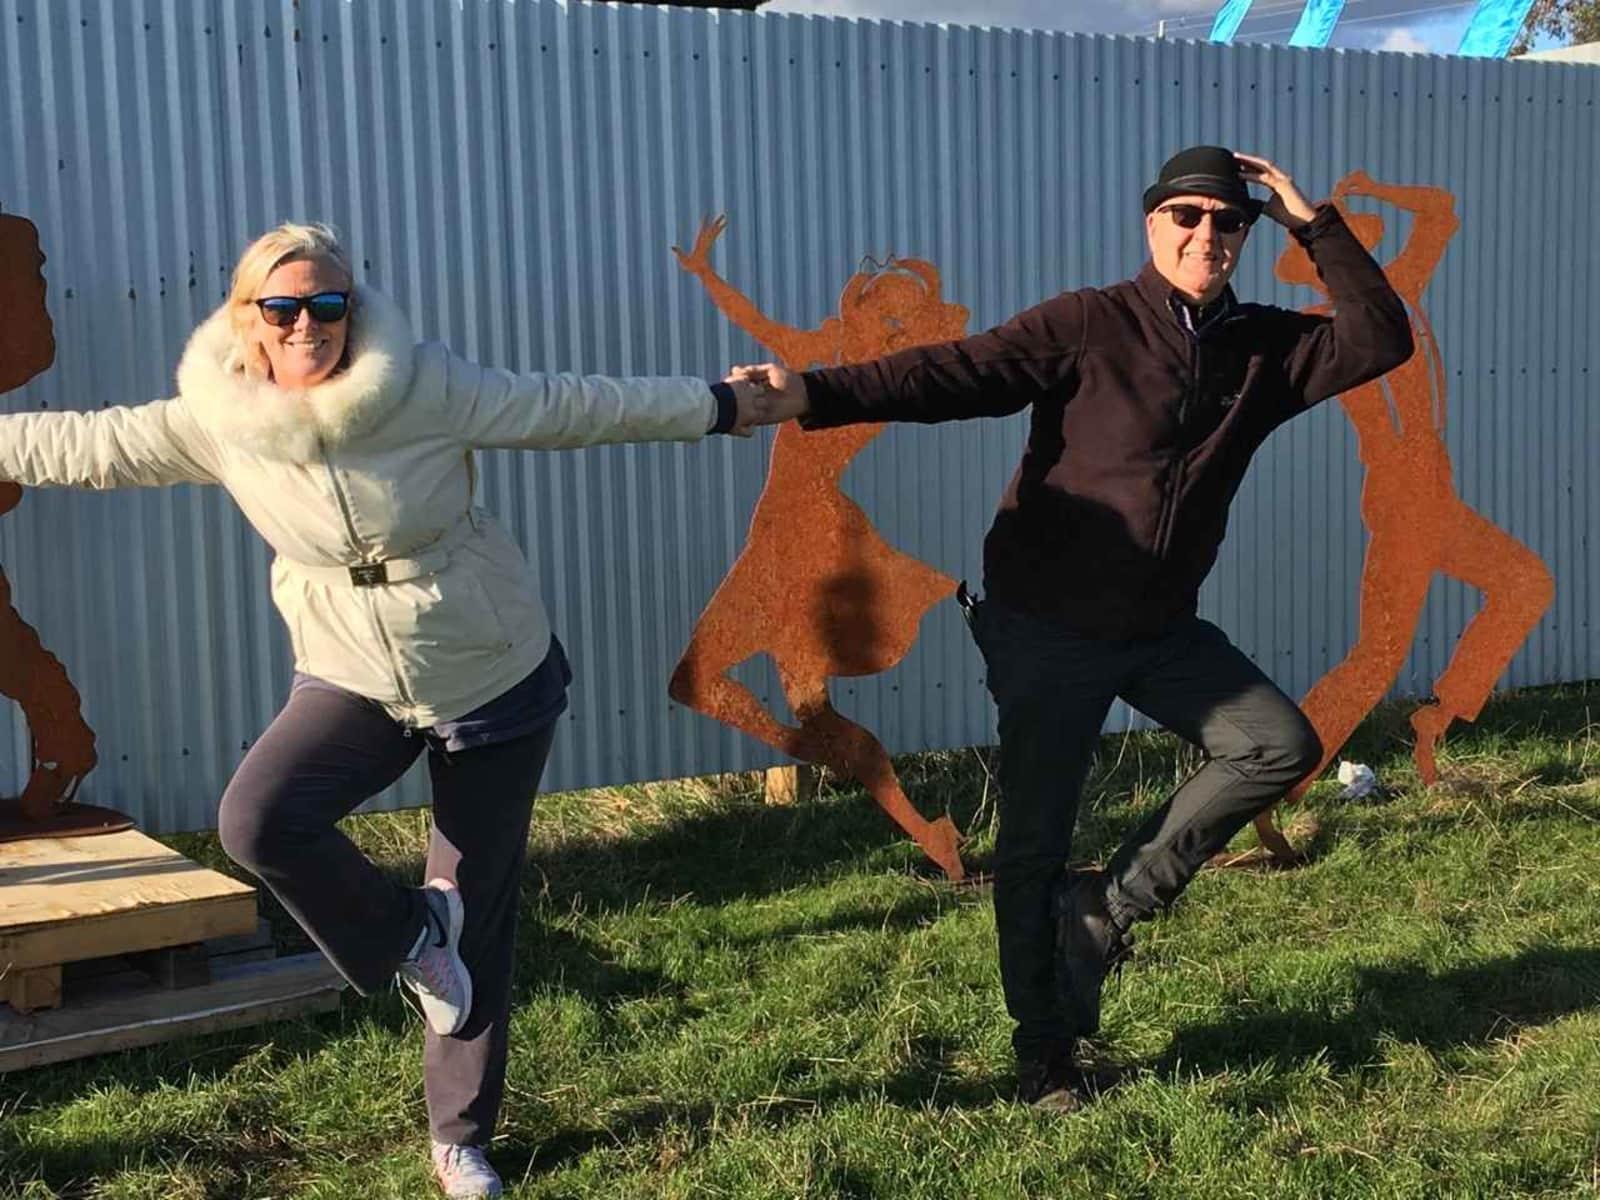 Paul & Marijke from Melbourne, Victoria, Australia